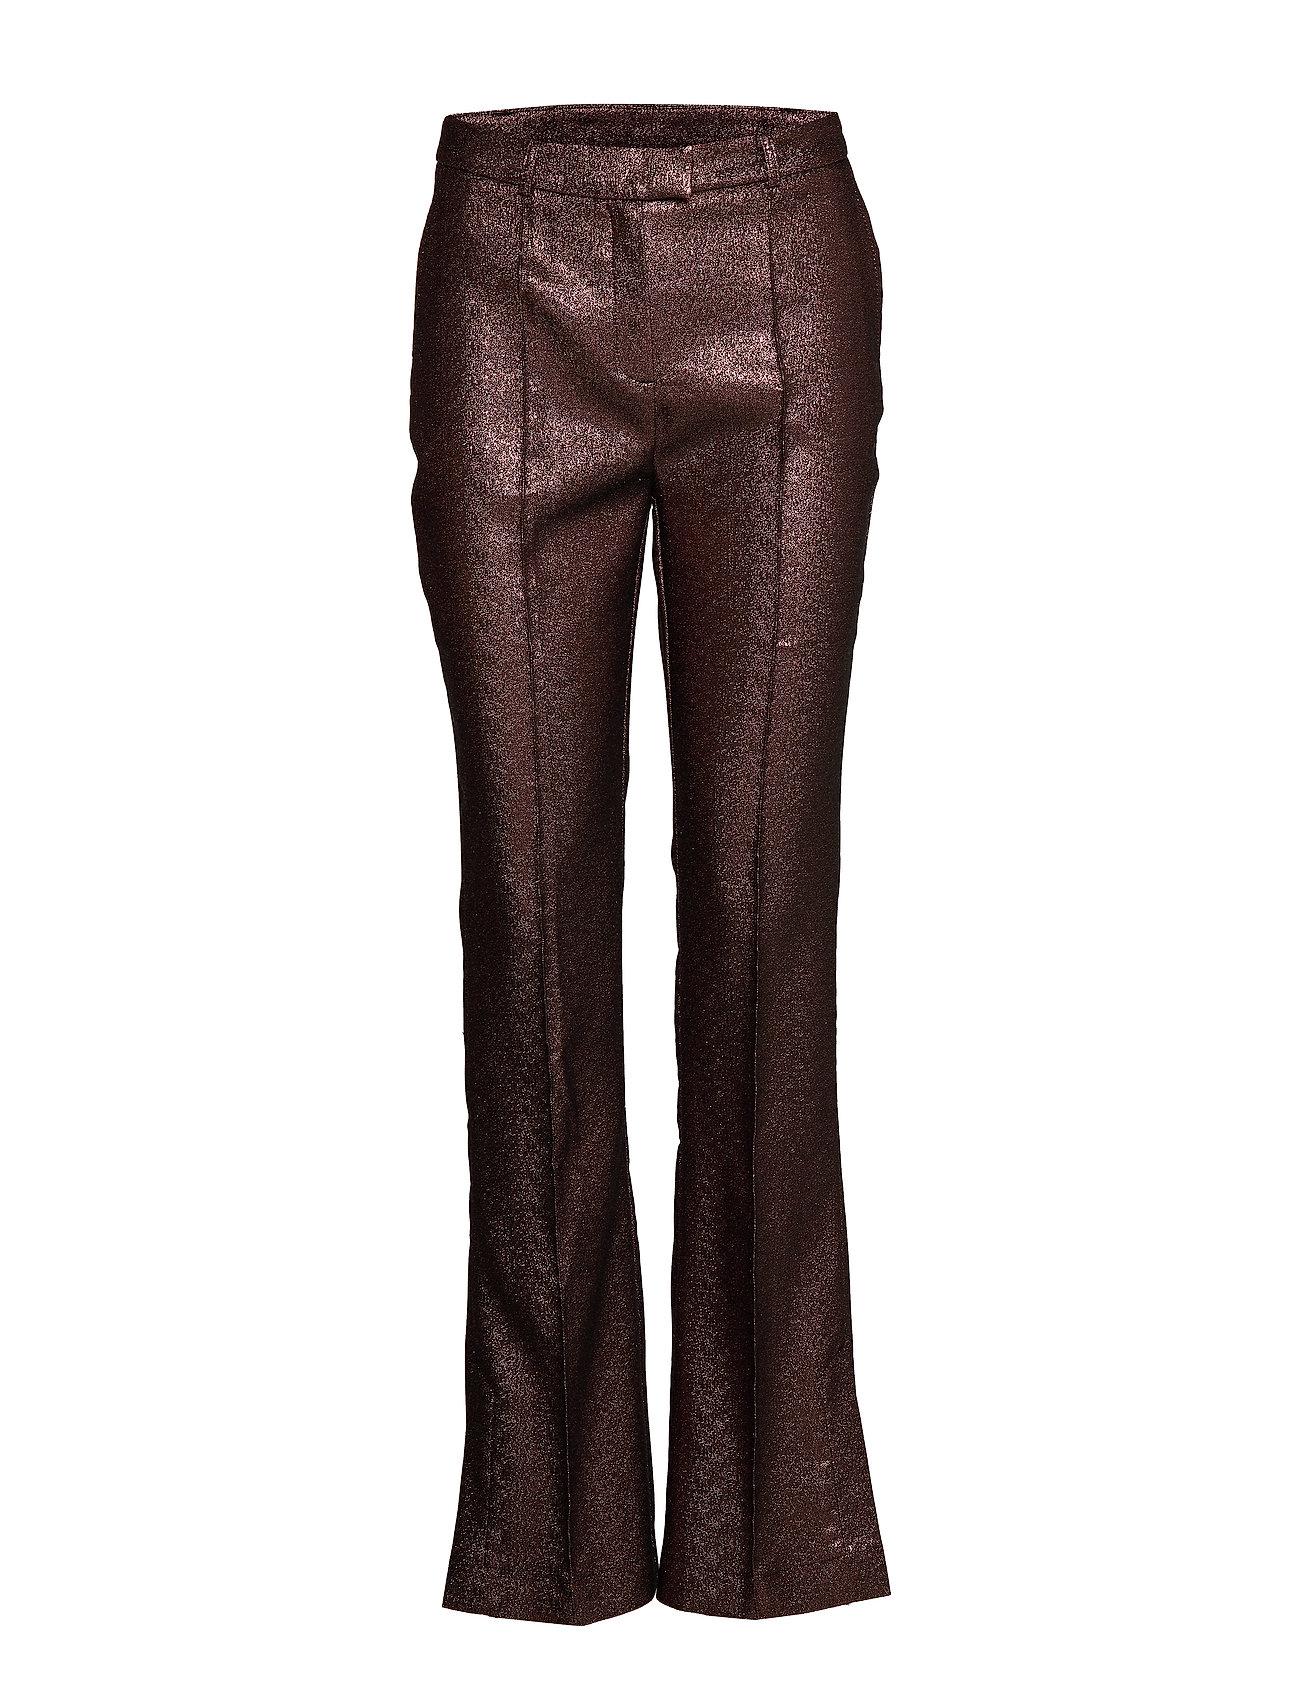 Image of Emma Pants Leather Leggings/Bukser Lyserød Birgitte Herskind (3220494601)